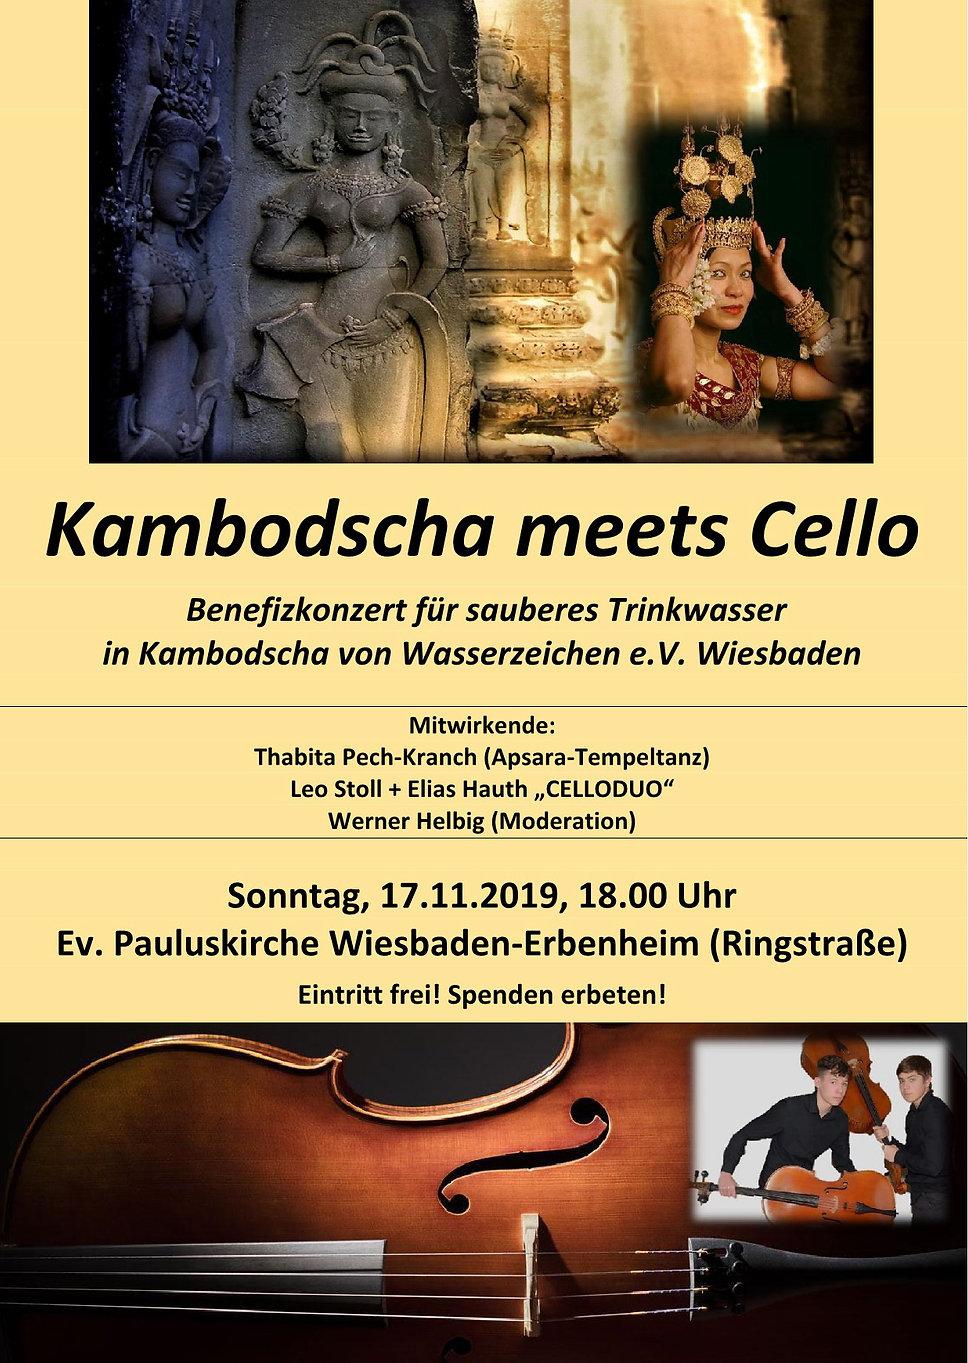 Kambodscha meets CelloPlakatd.jpeg